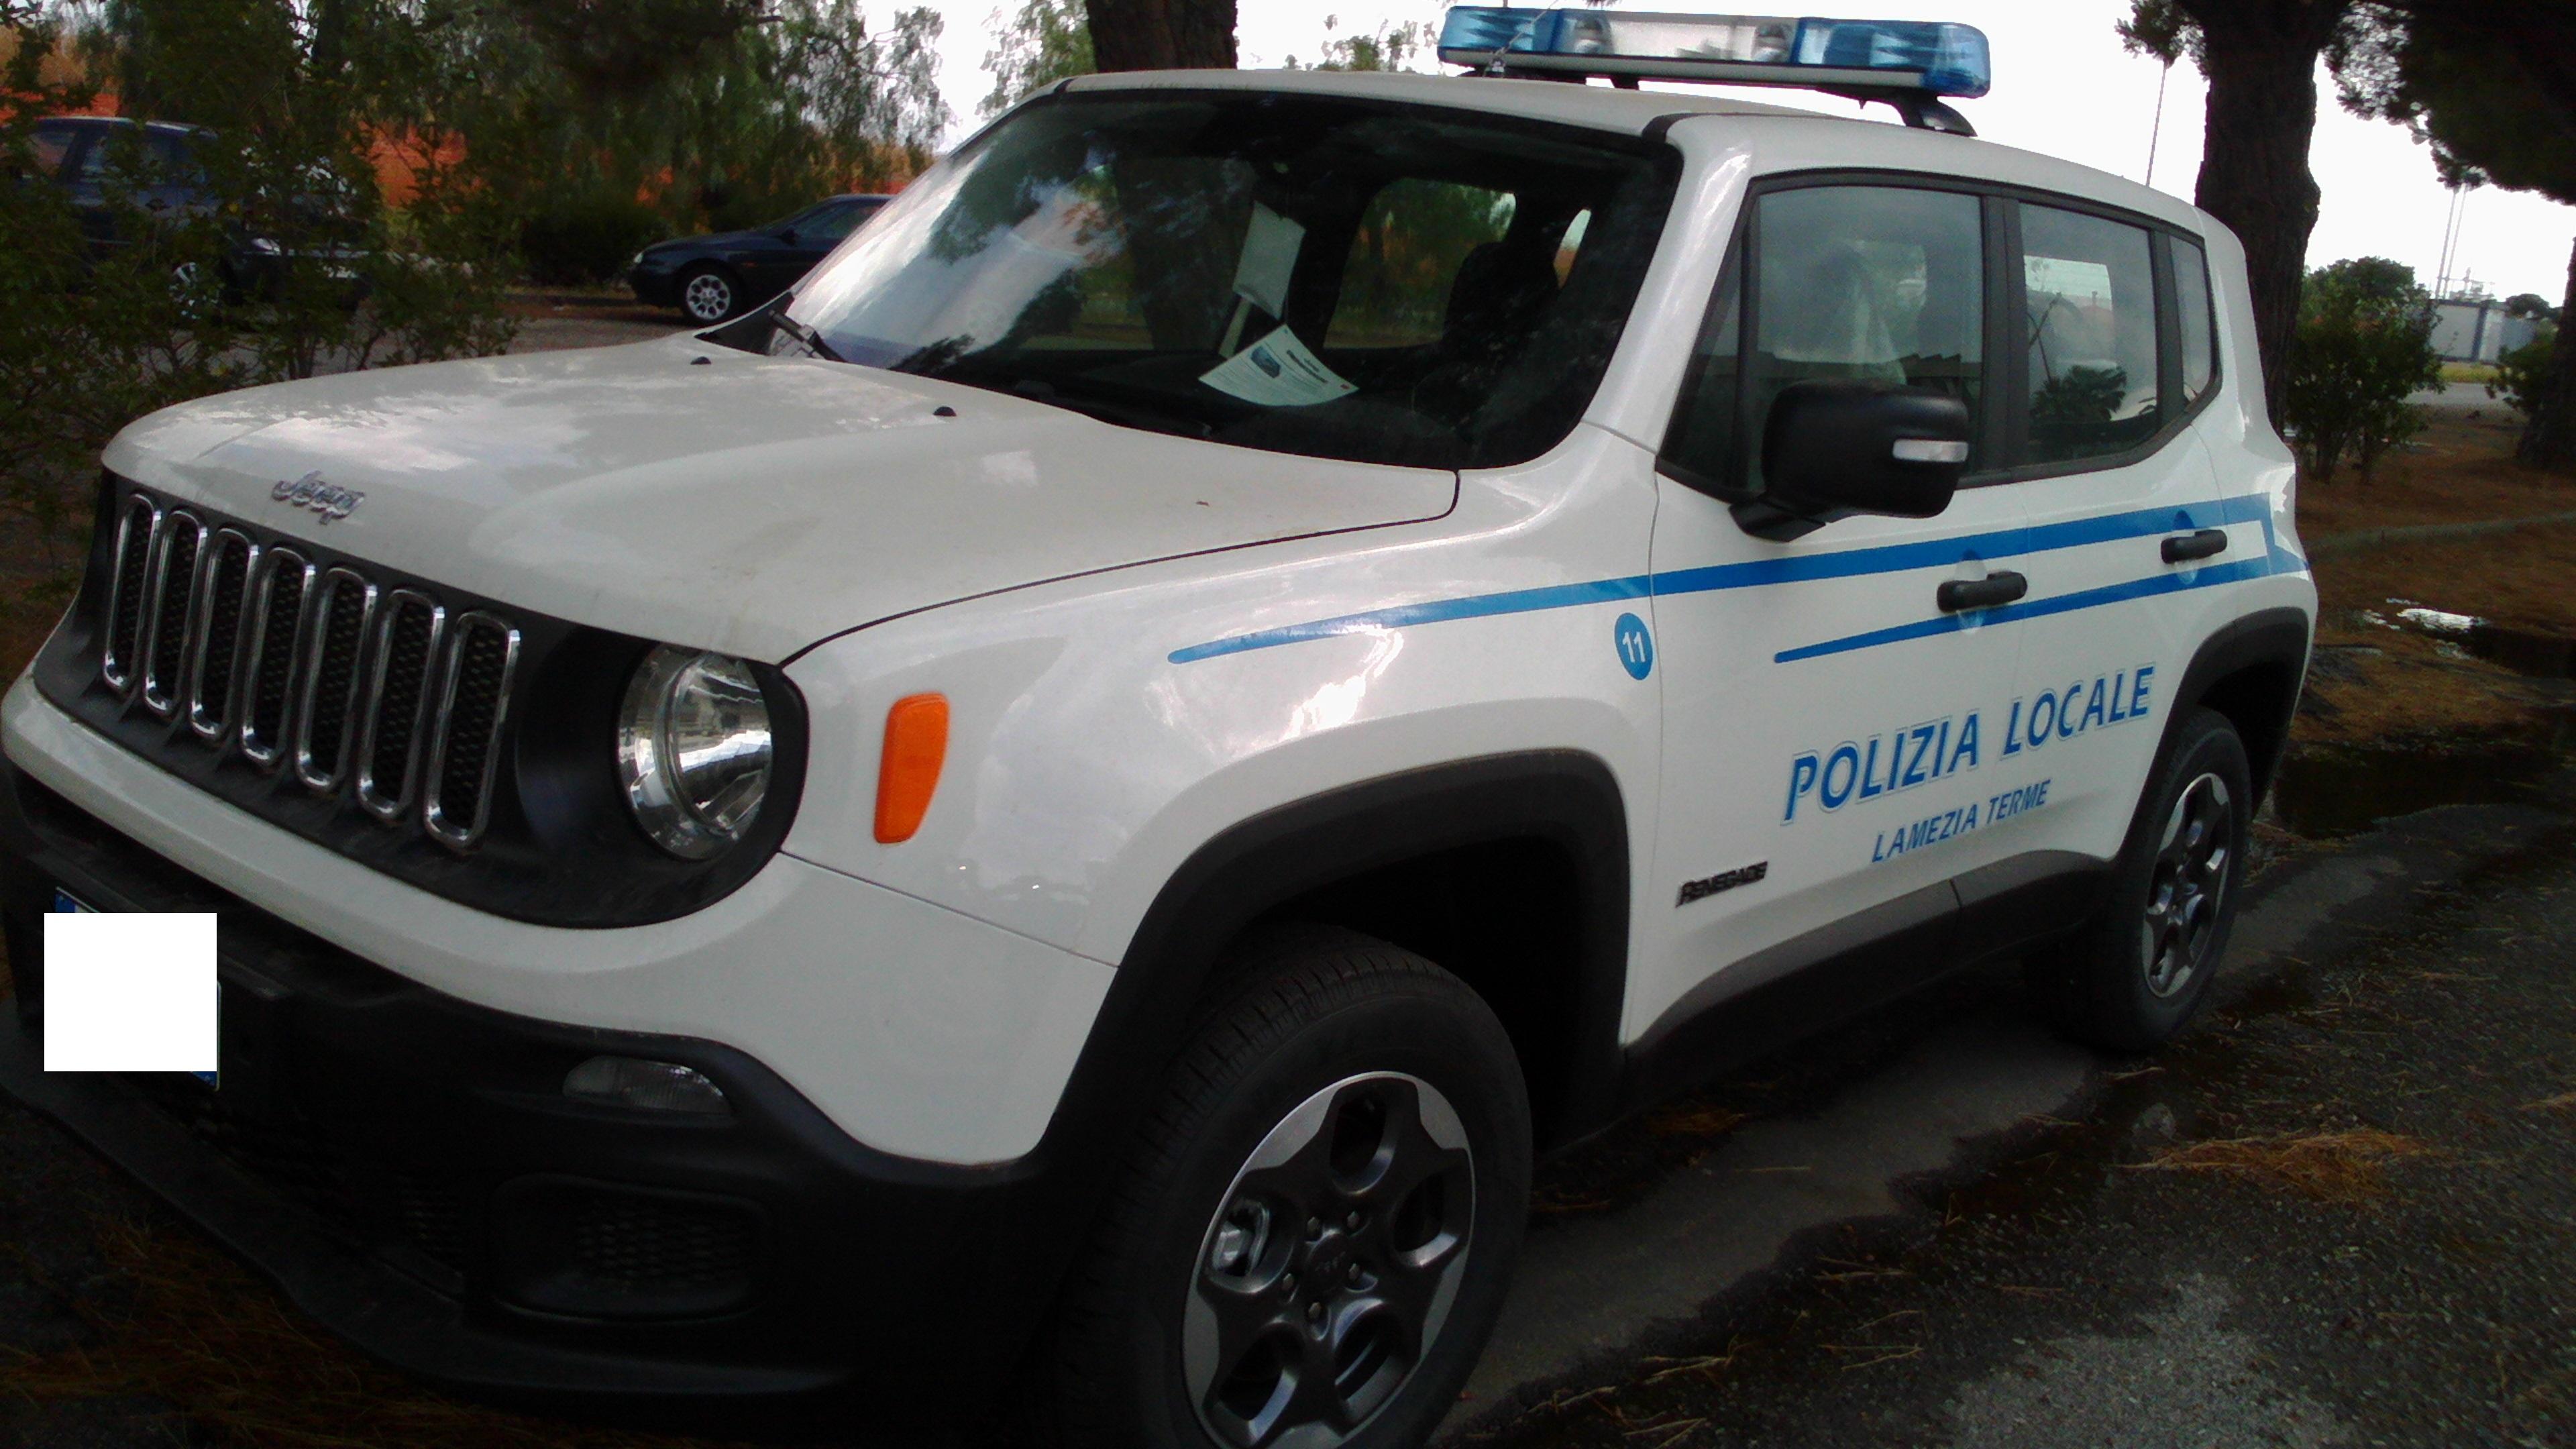 Polizia Locale LameziaTermeit